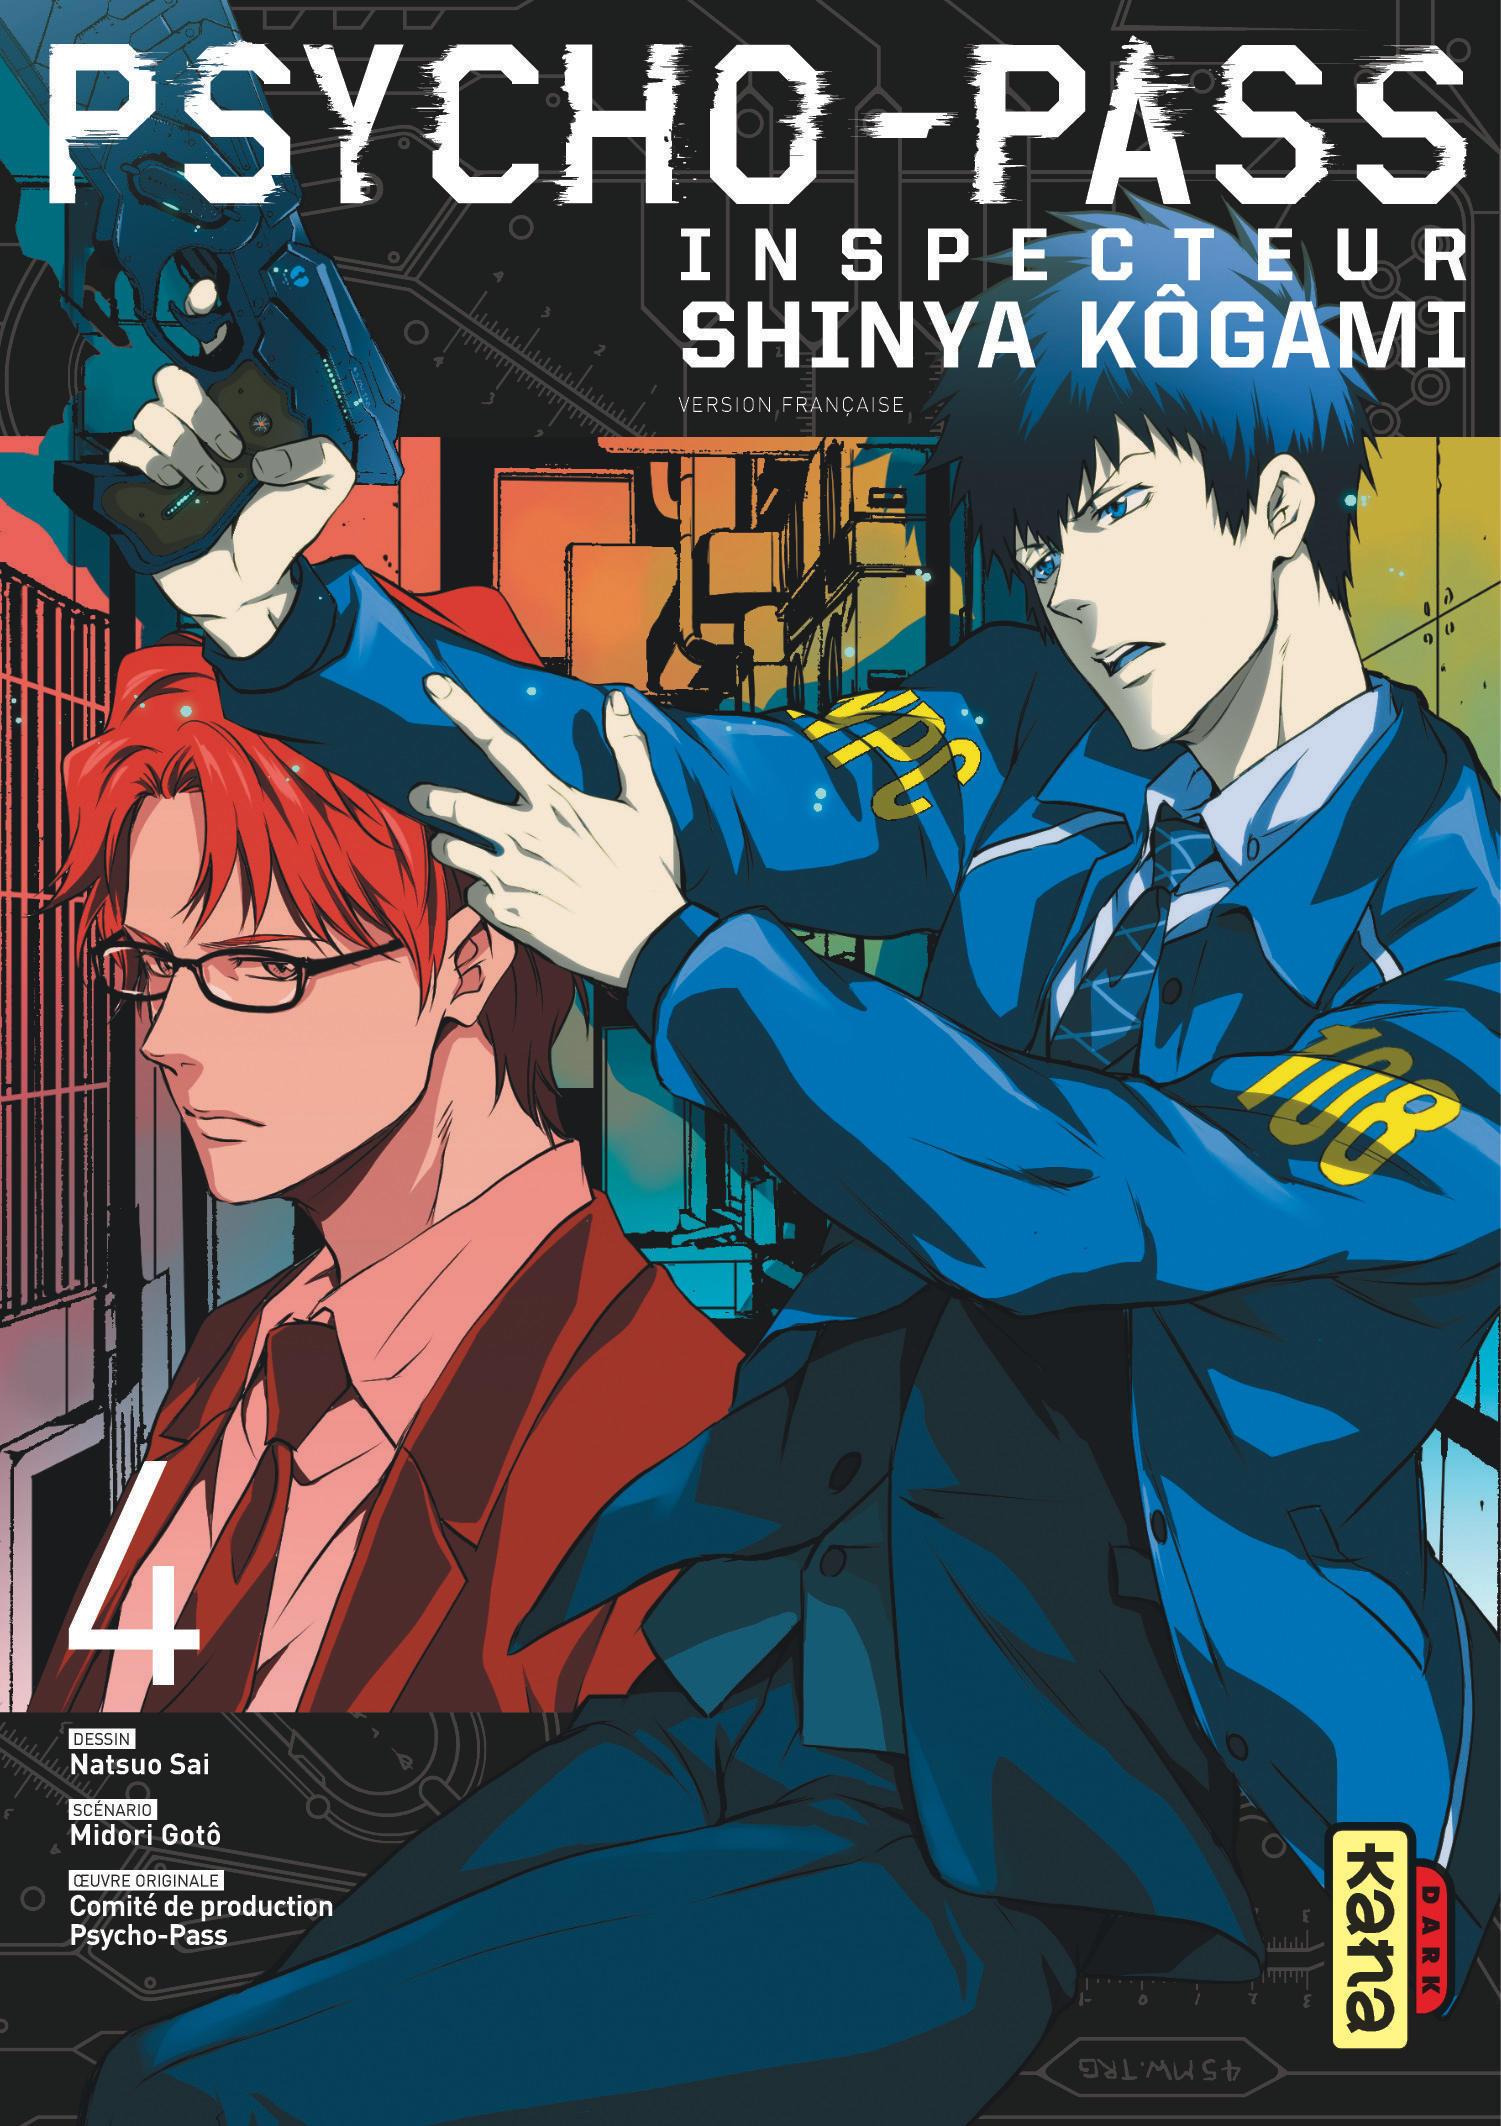 PSYCHO-PASS INSPECTEUR SHINYA KOGAMI - PROLOGUE T4